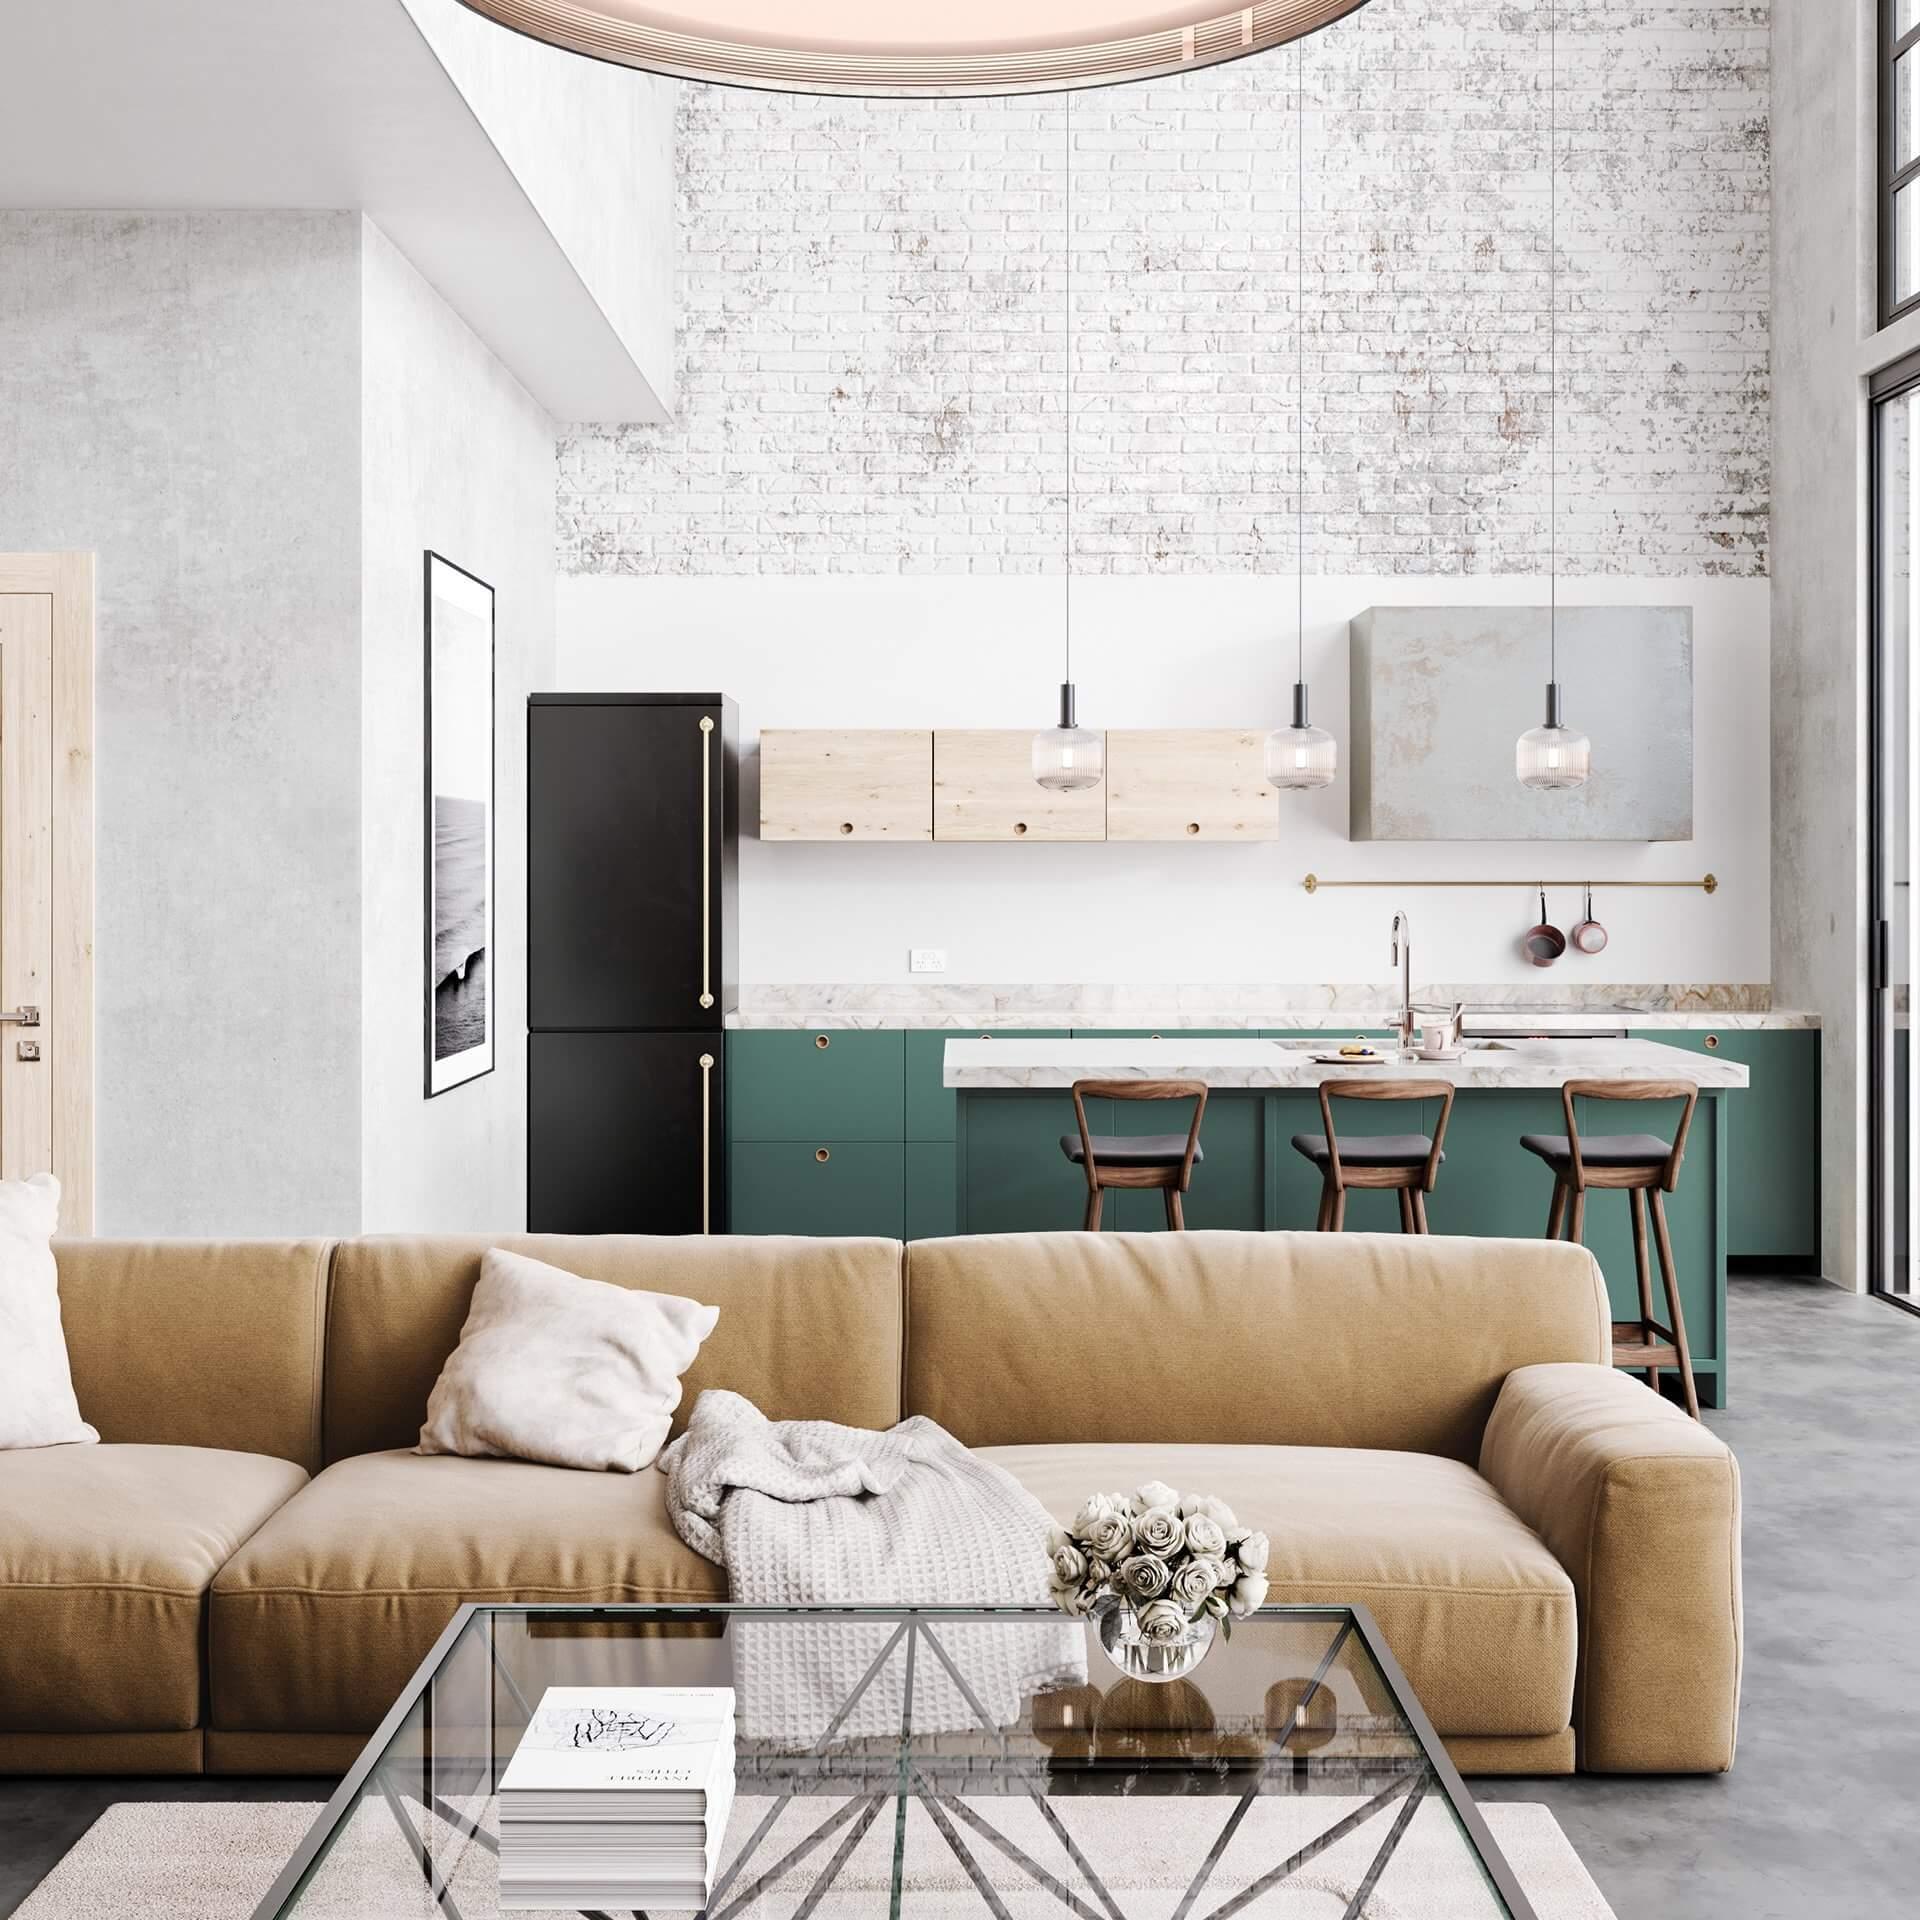 Sin-cinnati living room yellow couch green kitchen